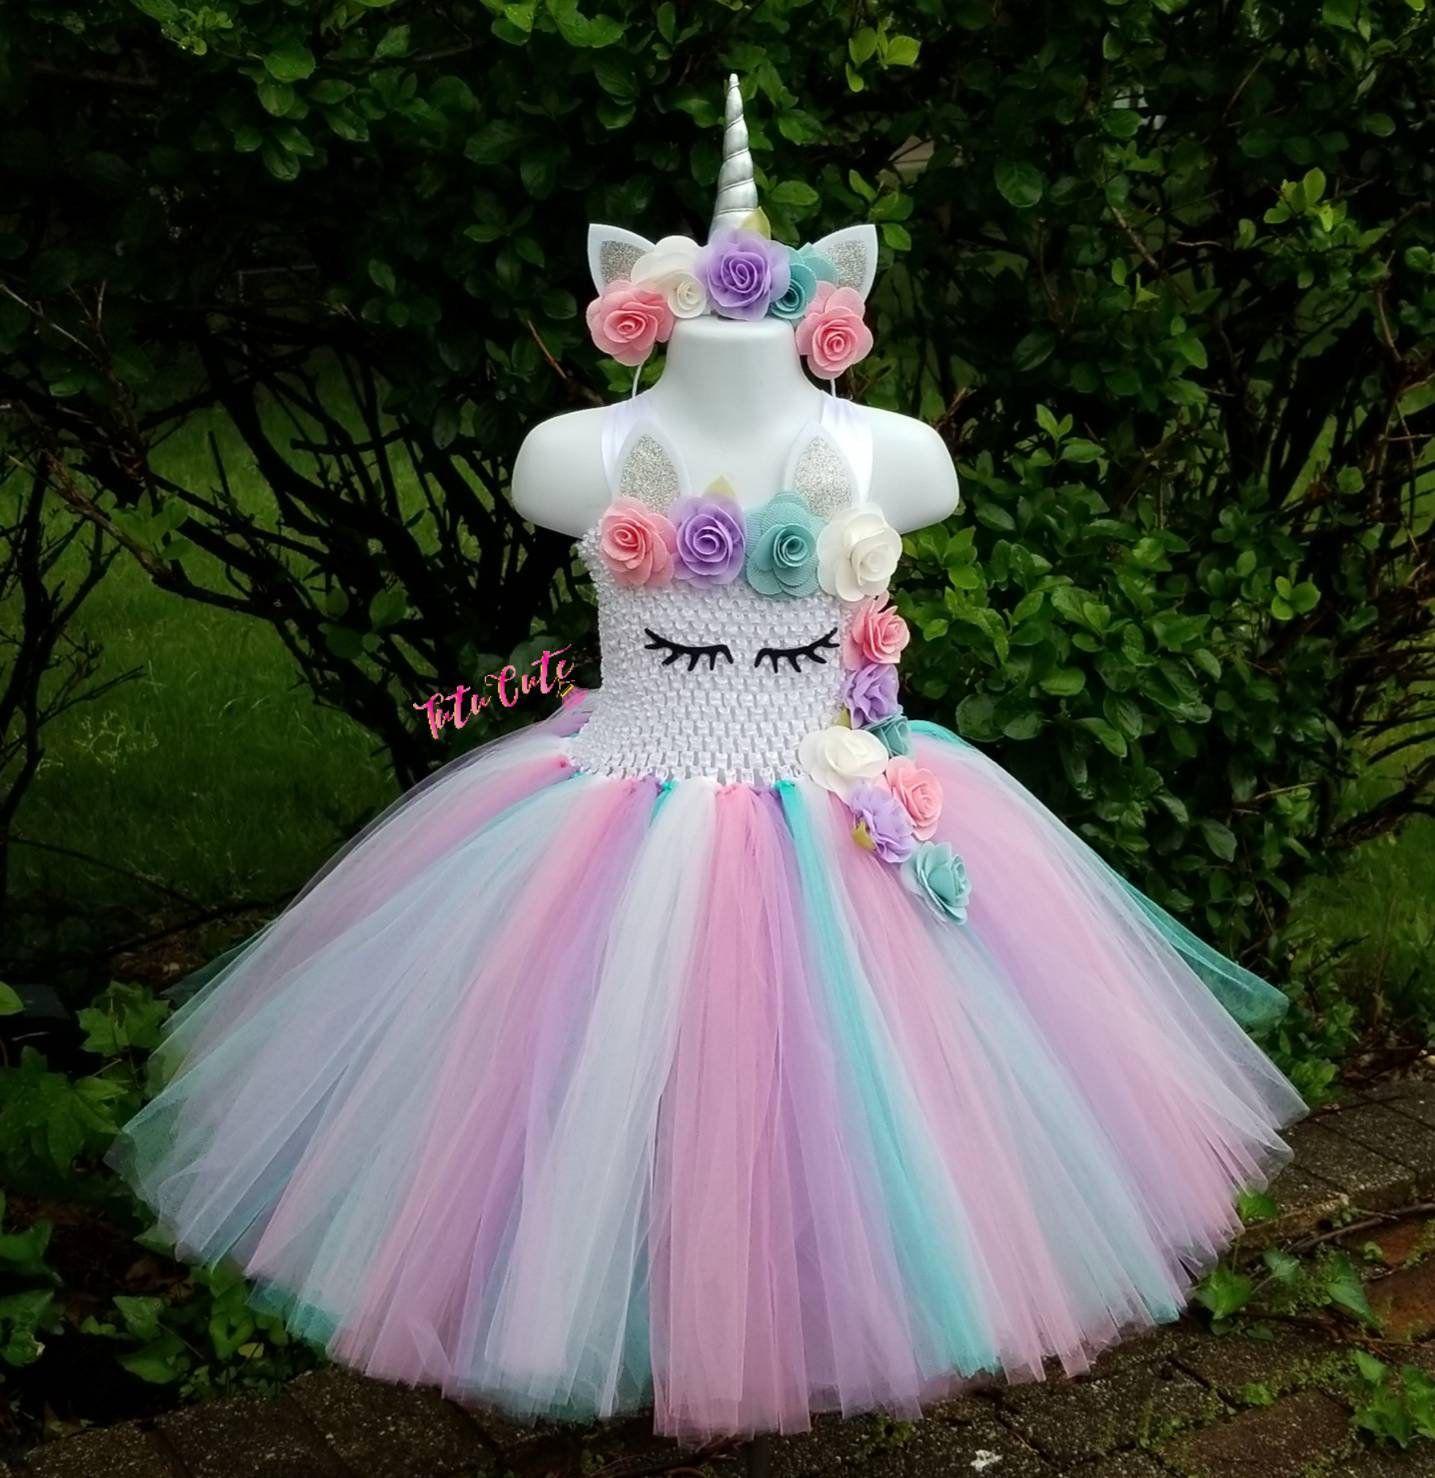 Baby Girls Birthday Party Dress Set Tutu Tulle Princess Outfit Unicorn Headband